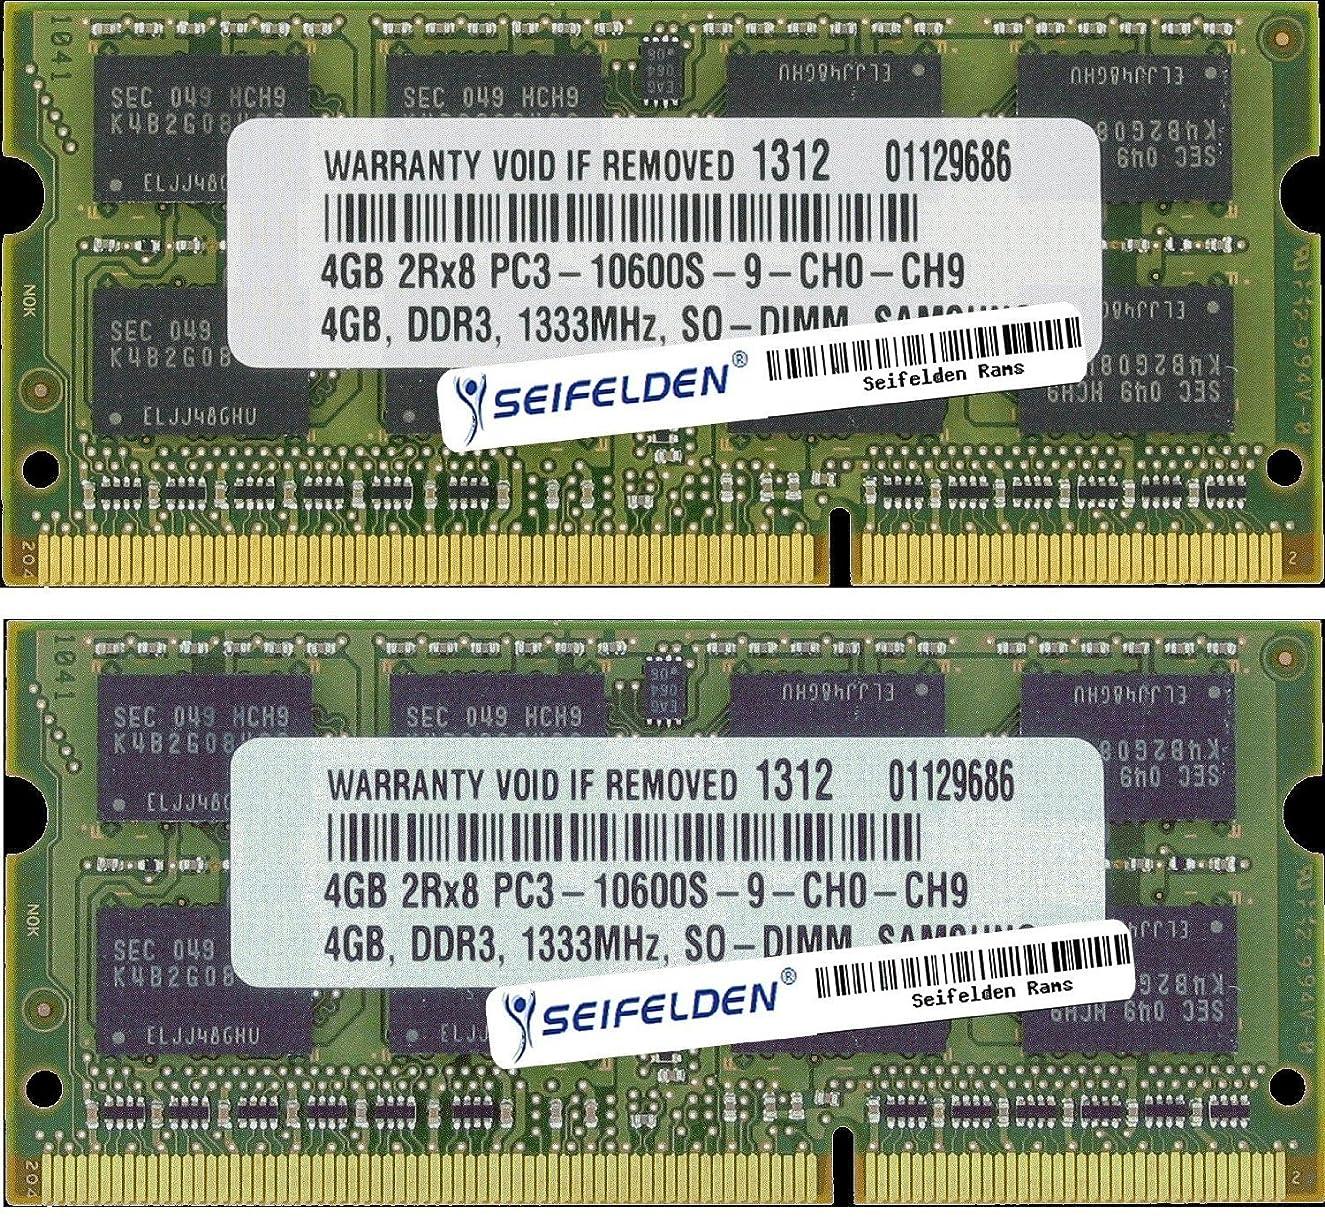 Seifelden 8GB (2X4GB) Memory RAM for HP Pavilion DM4-1265DX DM4-1273CA DM4-1275CA DM4-1277SB DM4-2015DX DM4-2033CL DM4-2050US DM4-2053CA DM4-2055CA DM4-2058CA